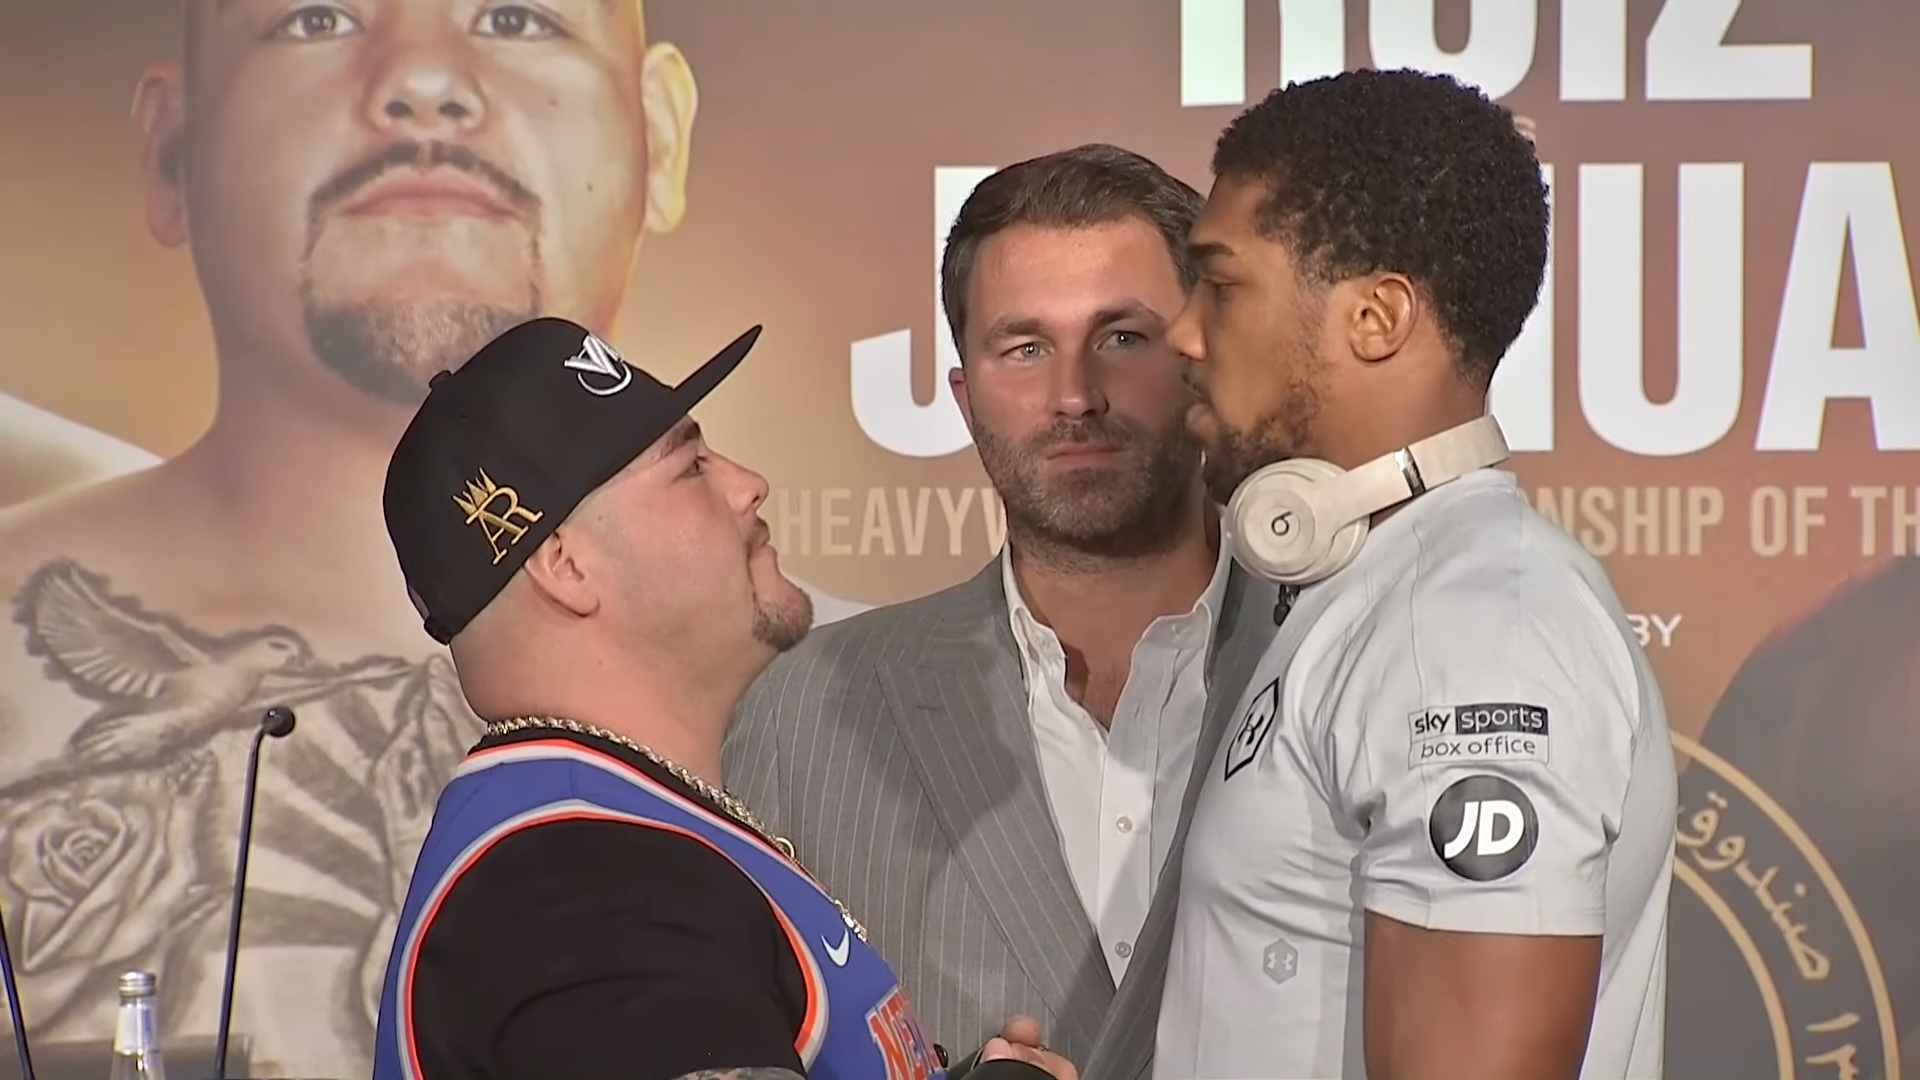 Andy Ruiz Jr. vs. Anthony Joshua